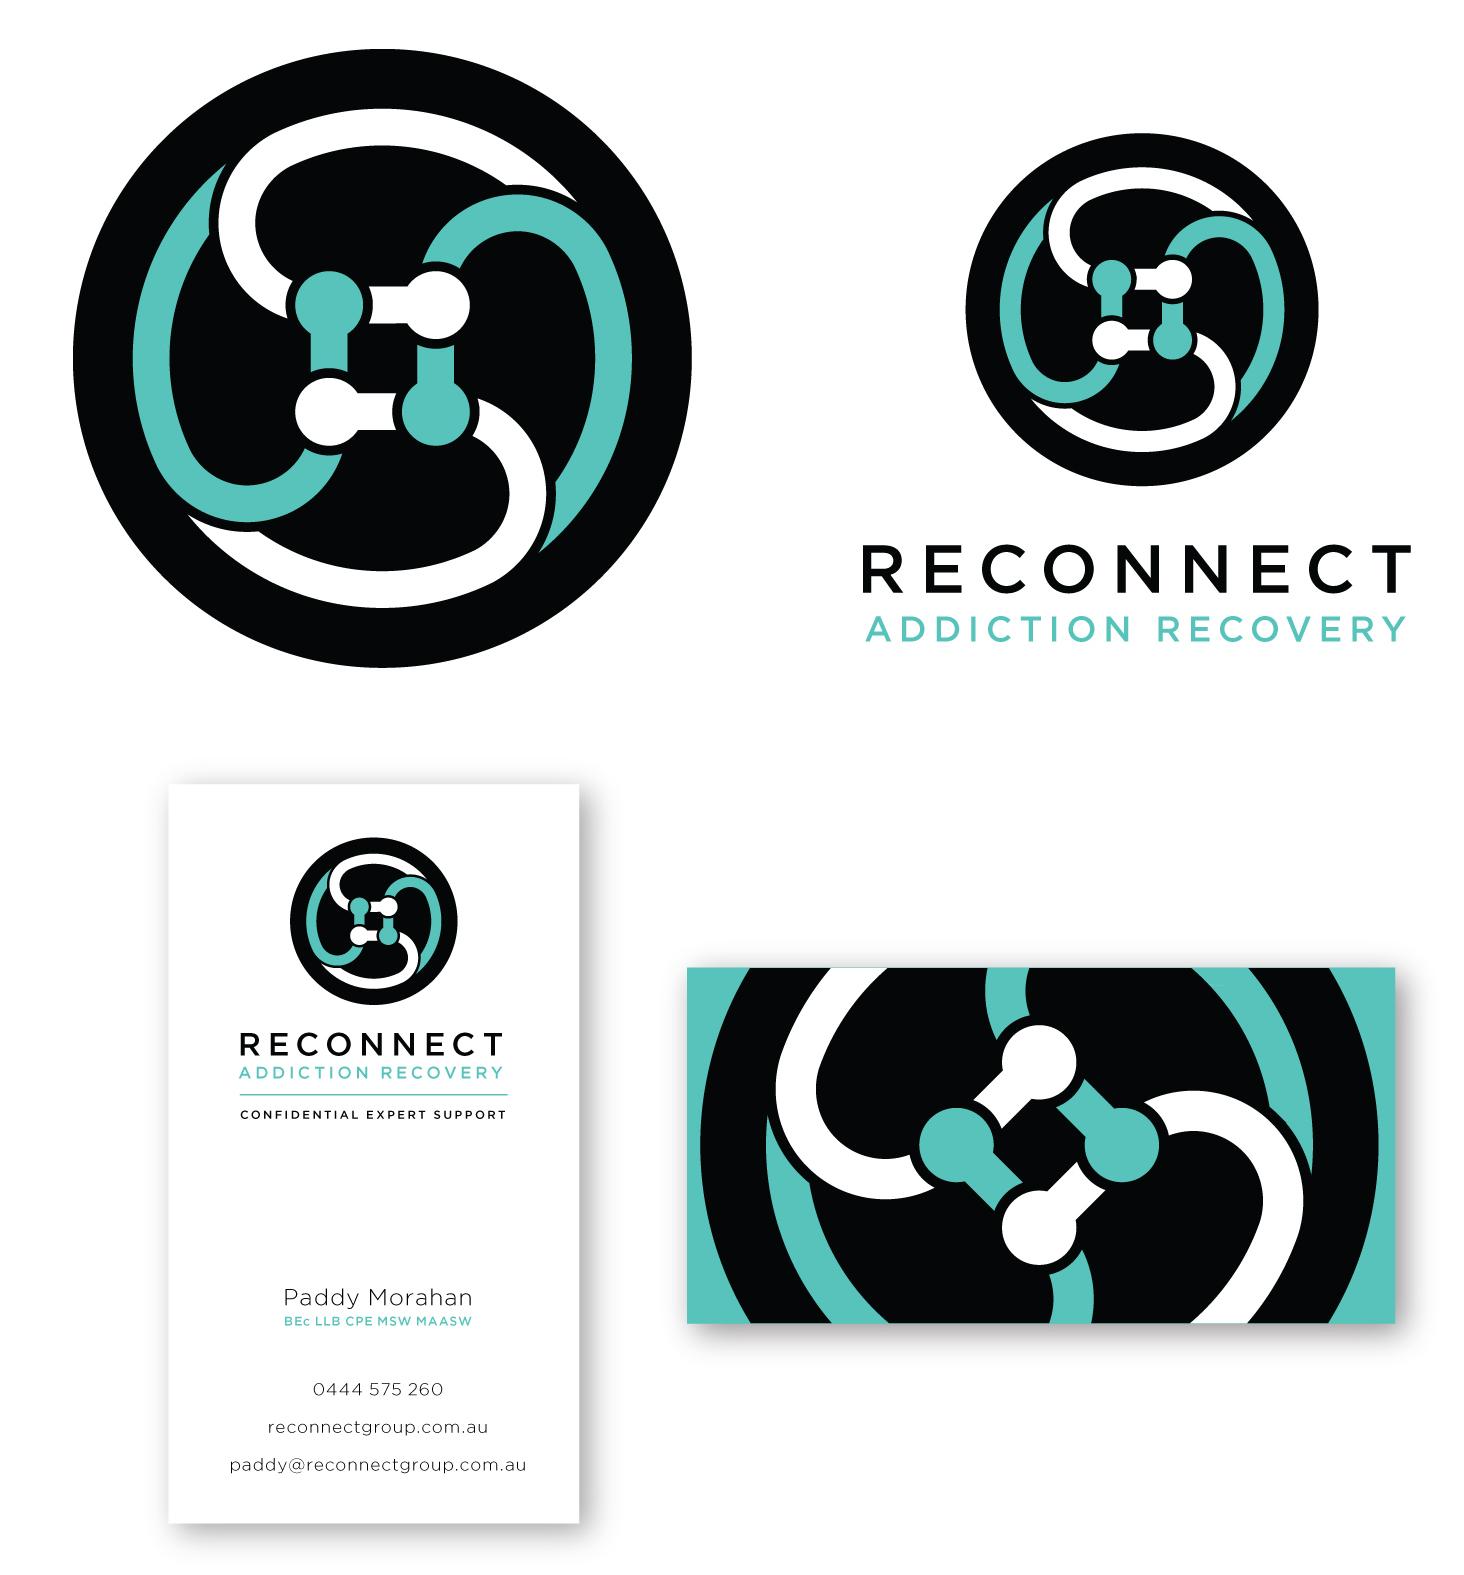 RECONNECTGROUP.jpg